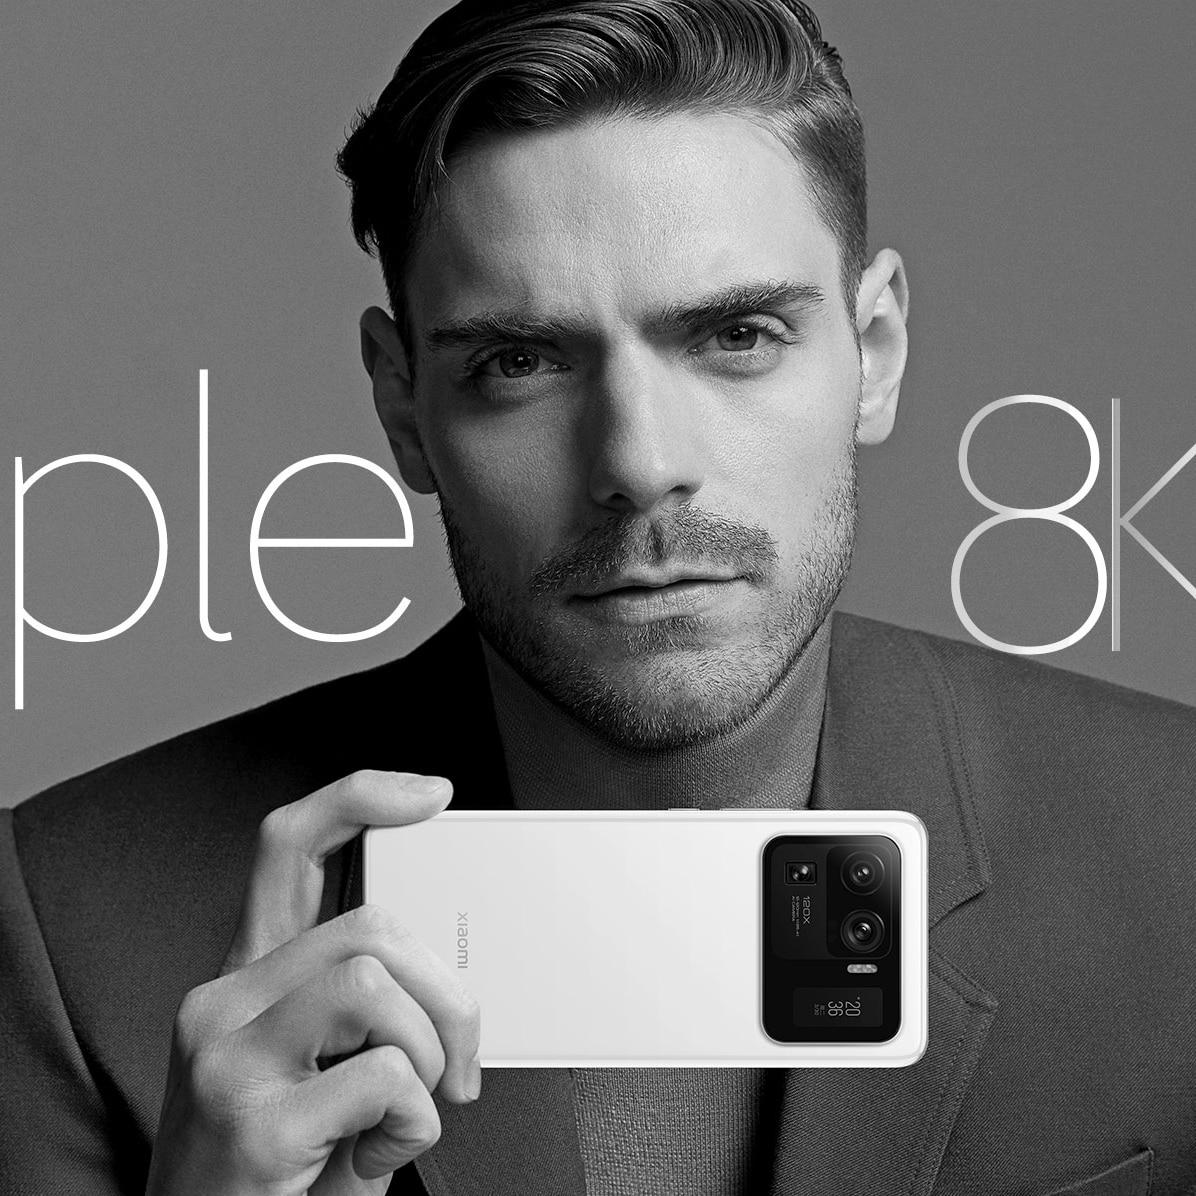 Global ROM Xiaomi Mi 11 Ultra 5G Smartphone Snapdragon 888 50MP Camera 120HZ AMOLED Display 5000mAh 67W Fast Charge NFC enlarge